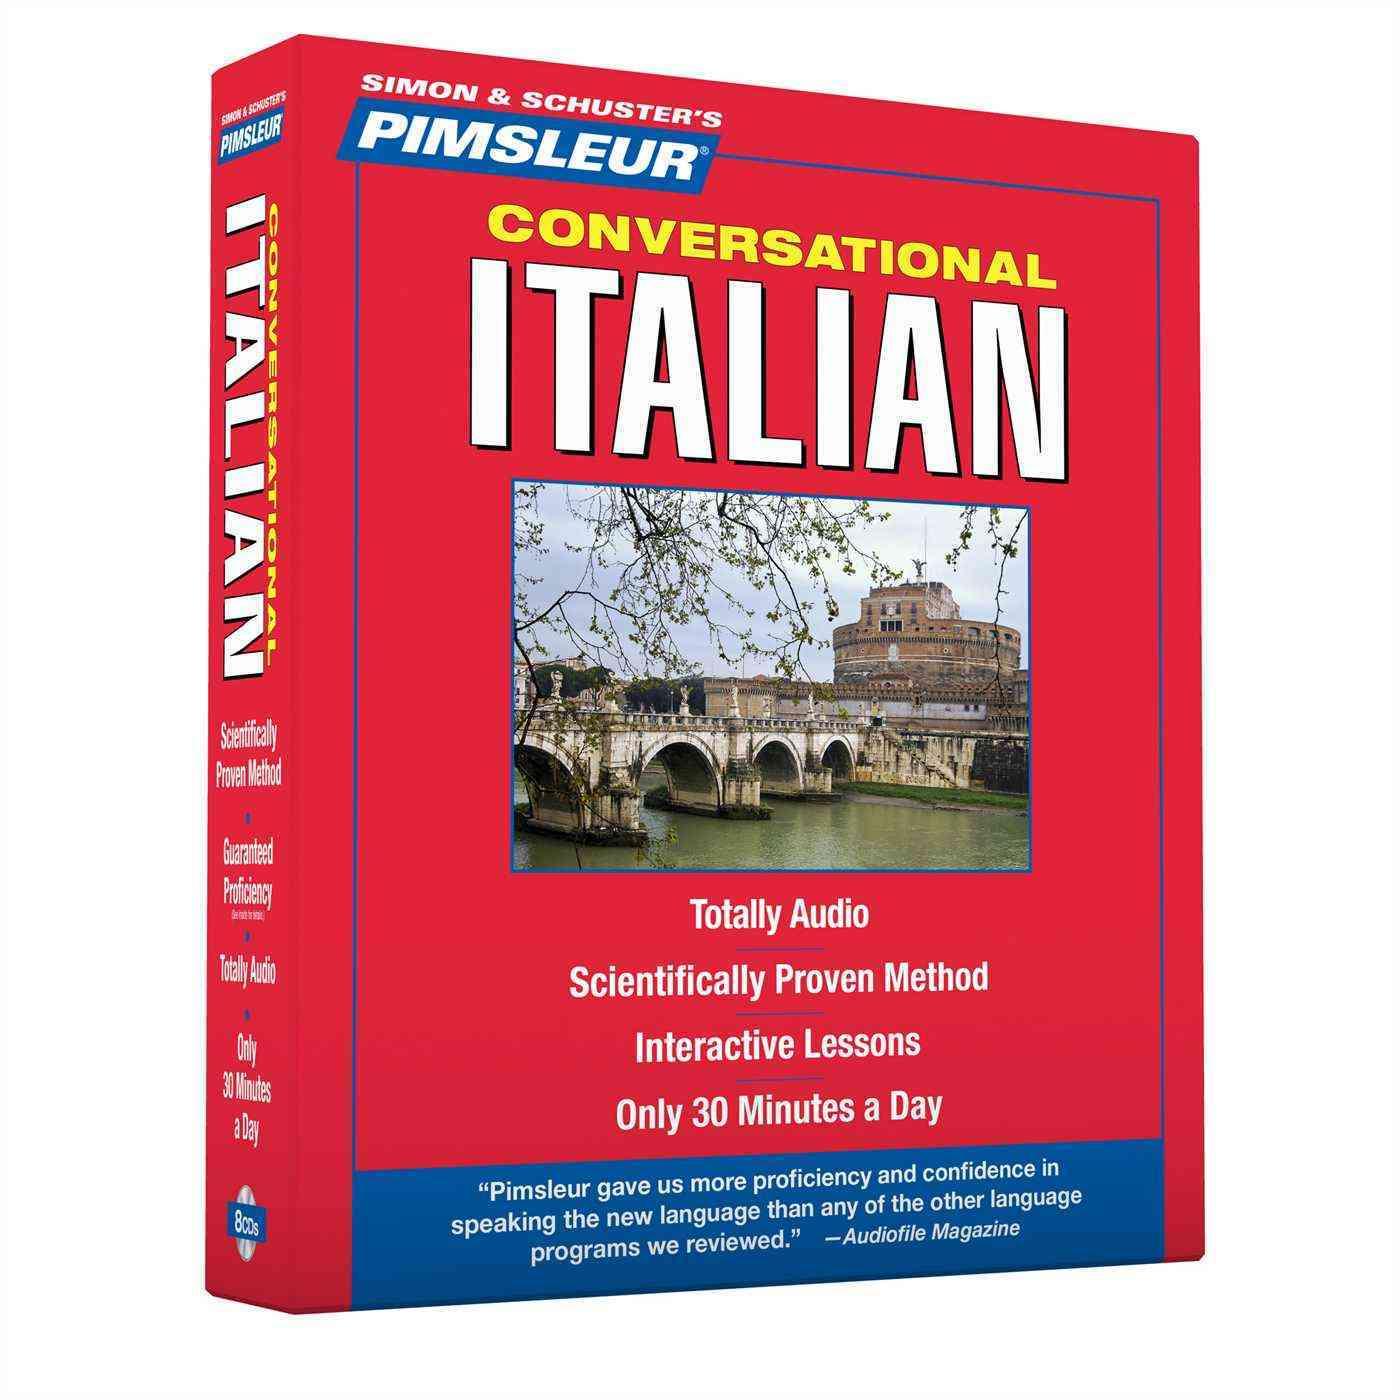 Pimsleur Conversational Italian (CD-Audio)